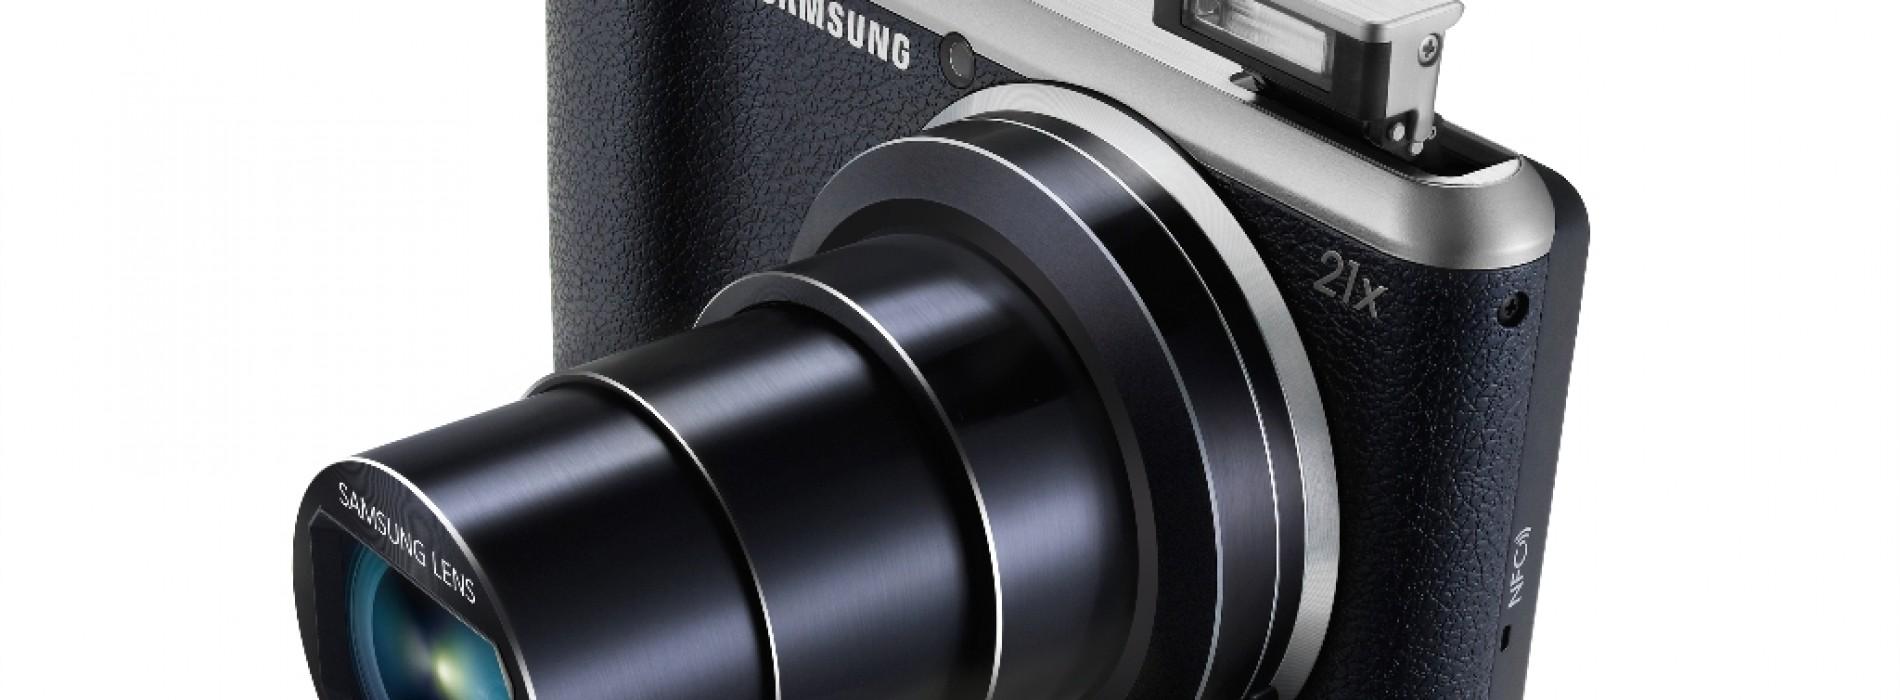 Samsung announces Galaxy Camera 2